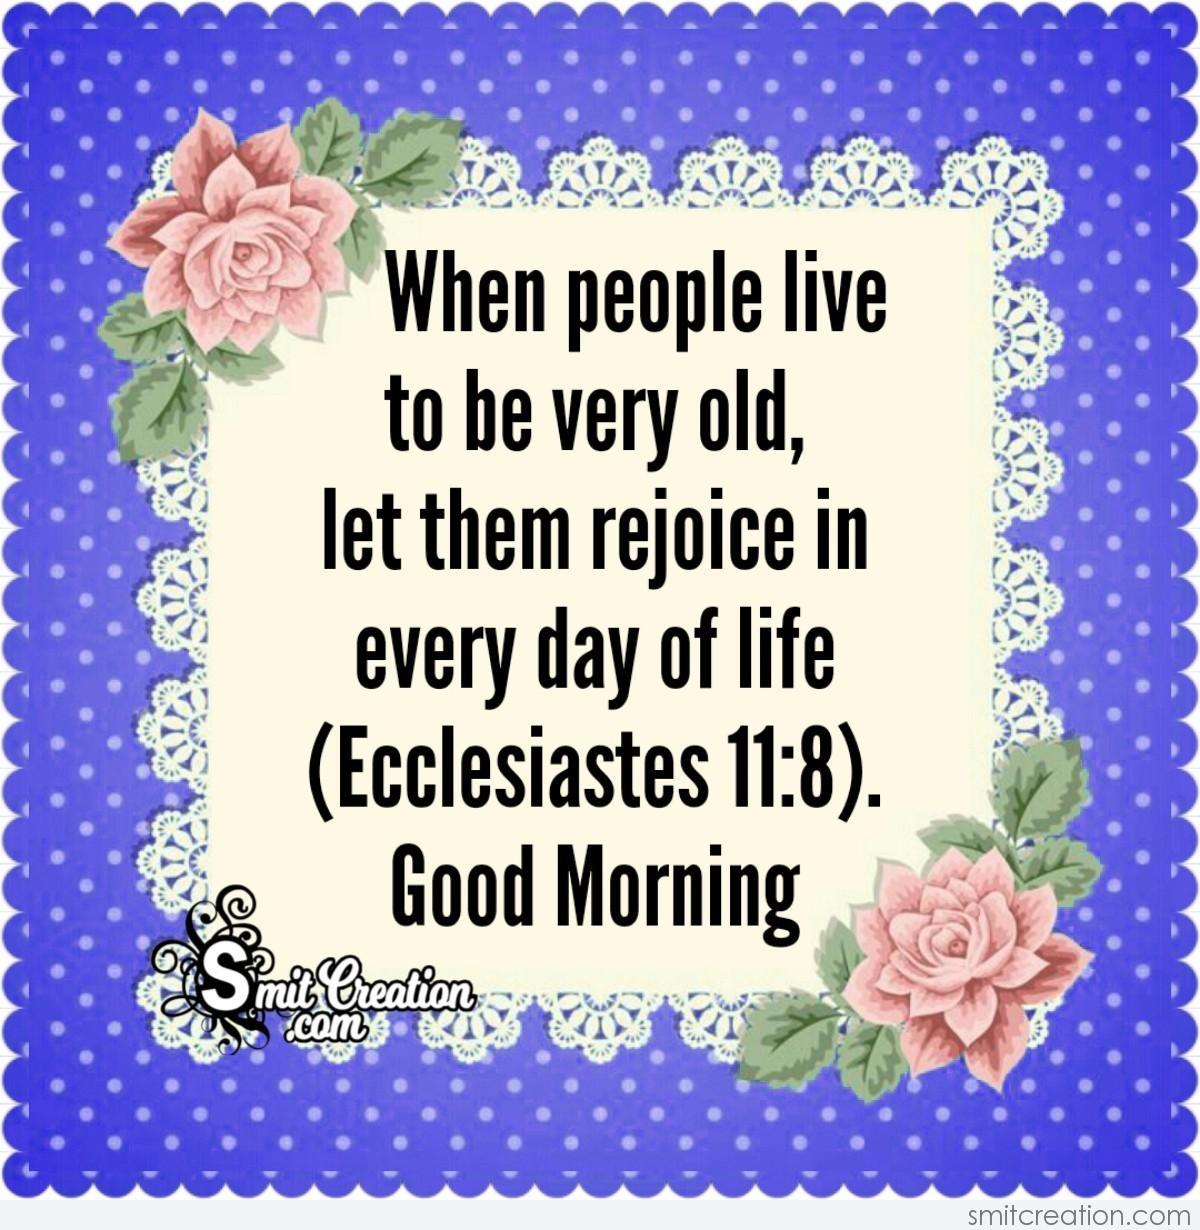 Good Morning Bible Quotes Images Smitcreation Com